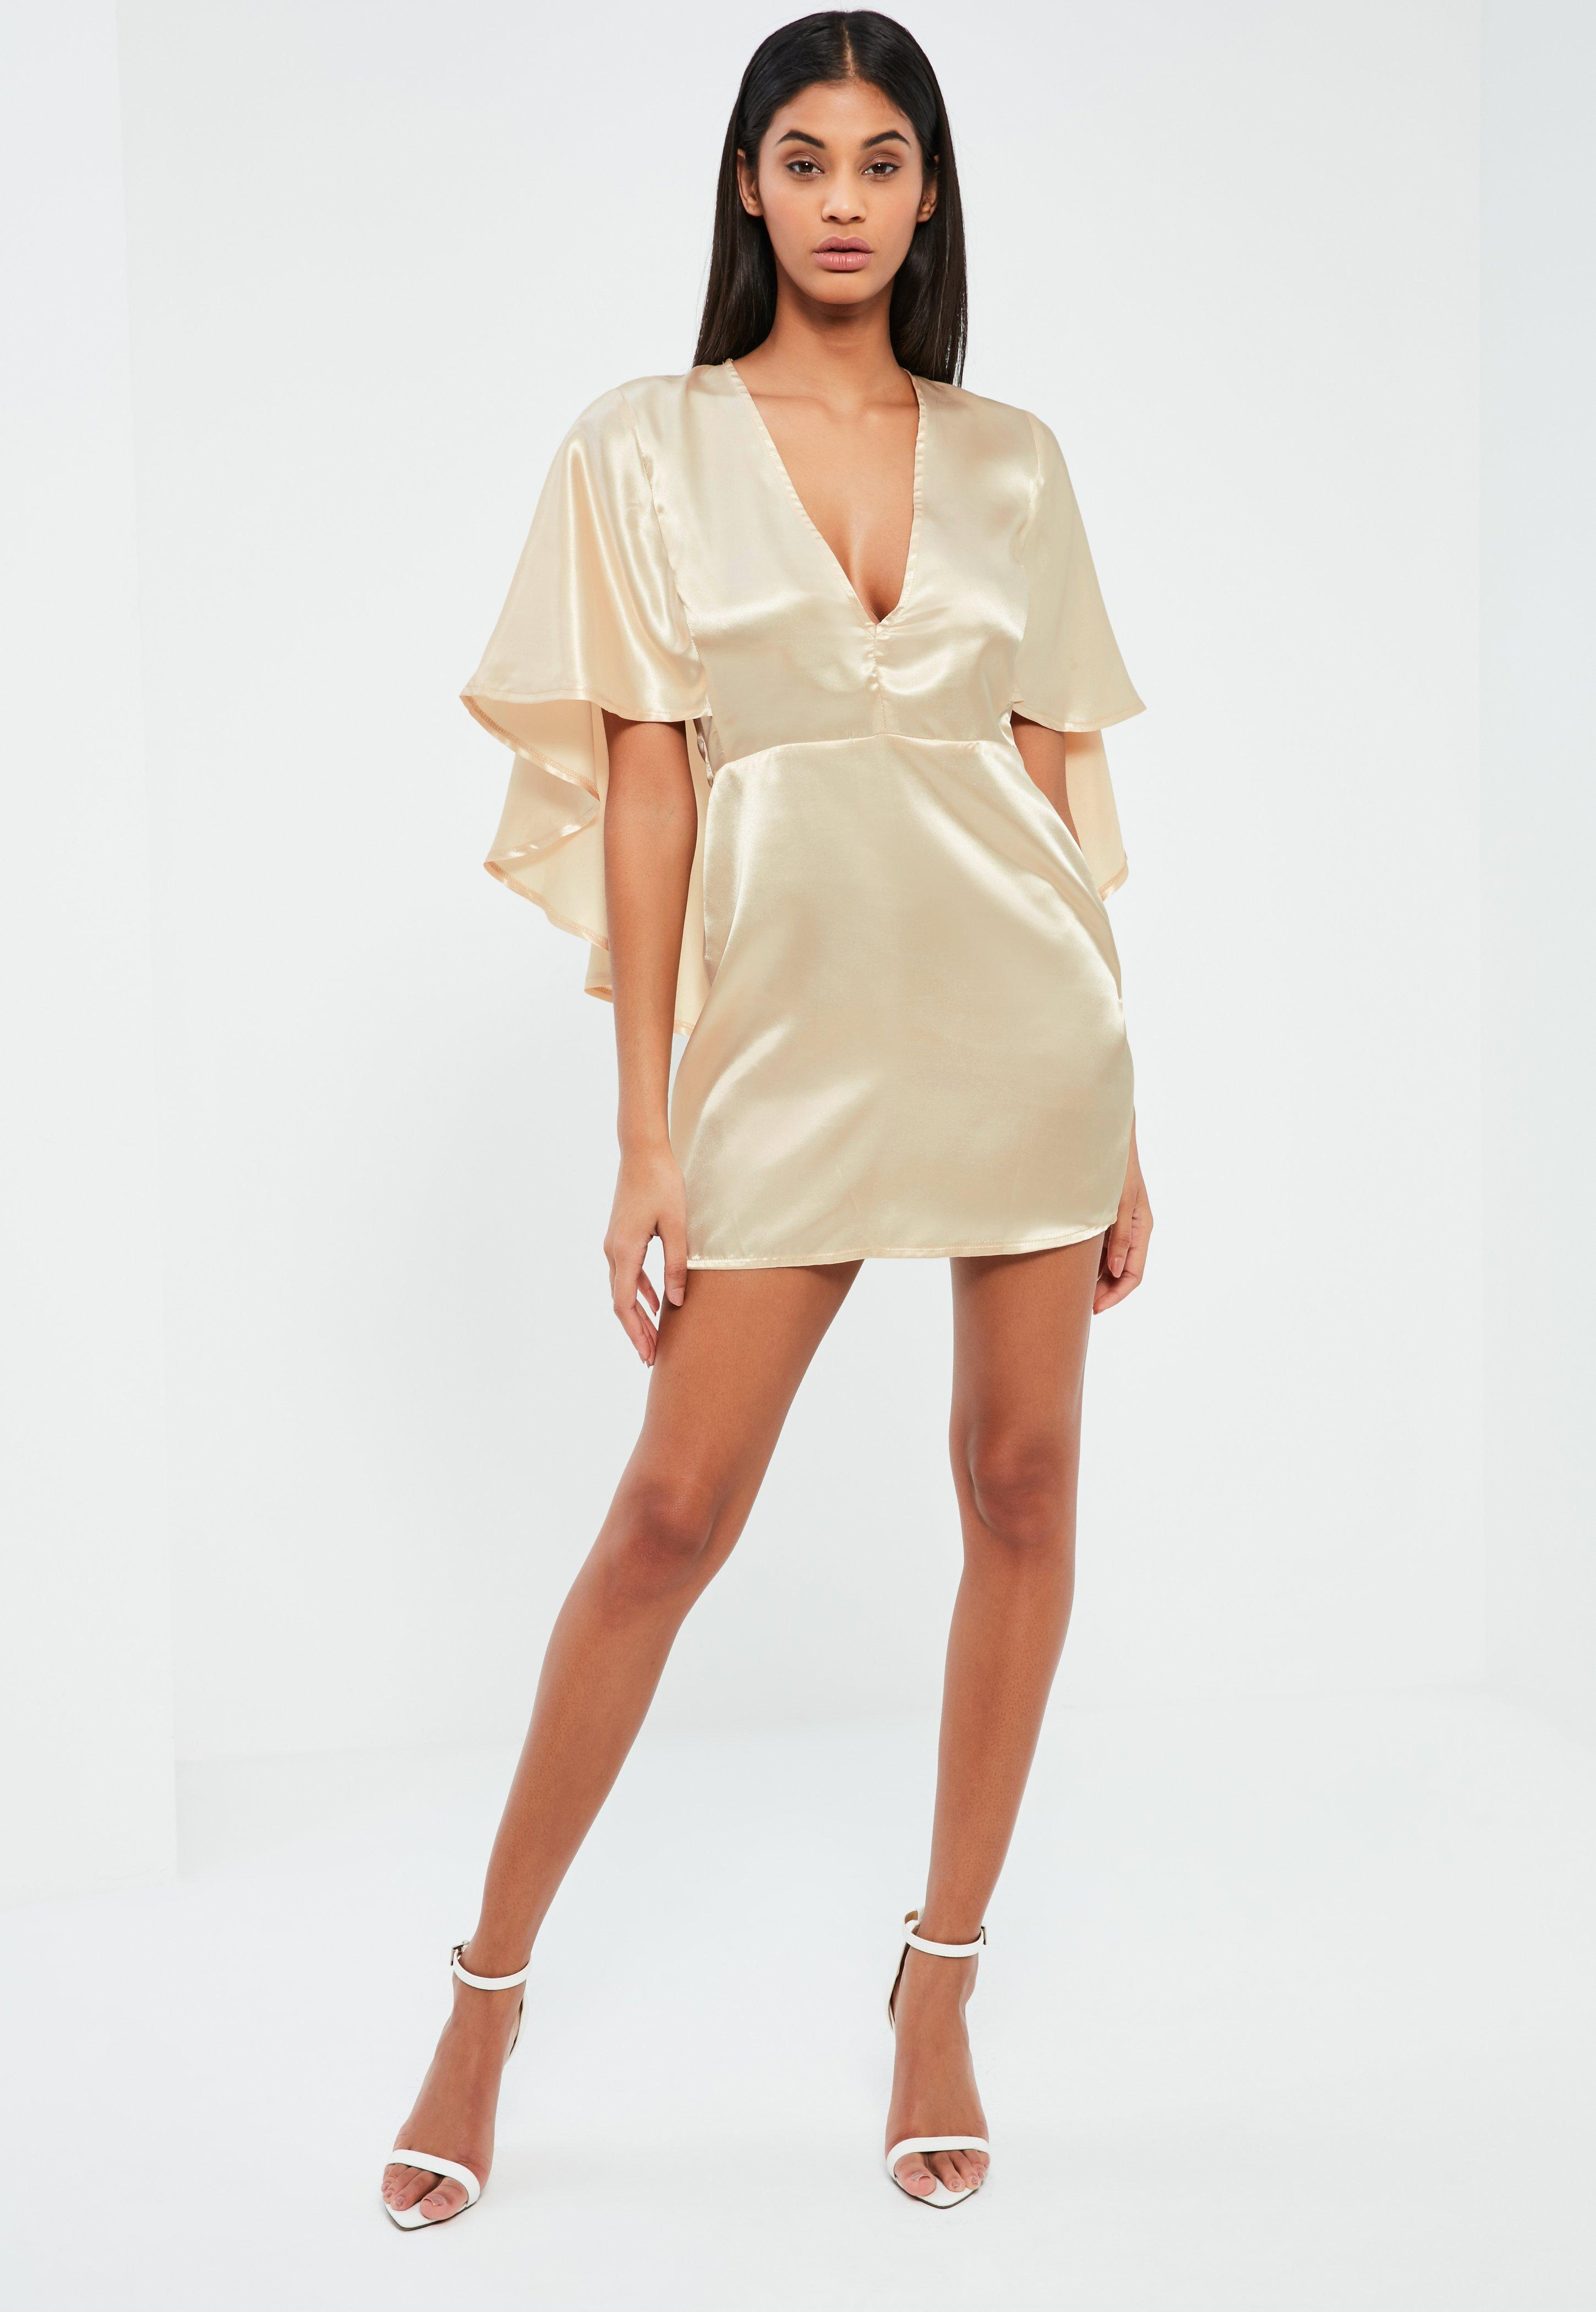 Nude Satin Flutter Cape Shift Dress